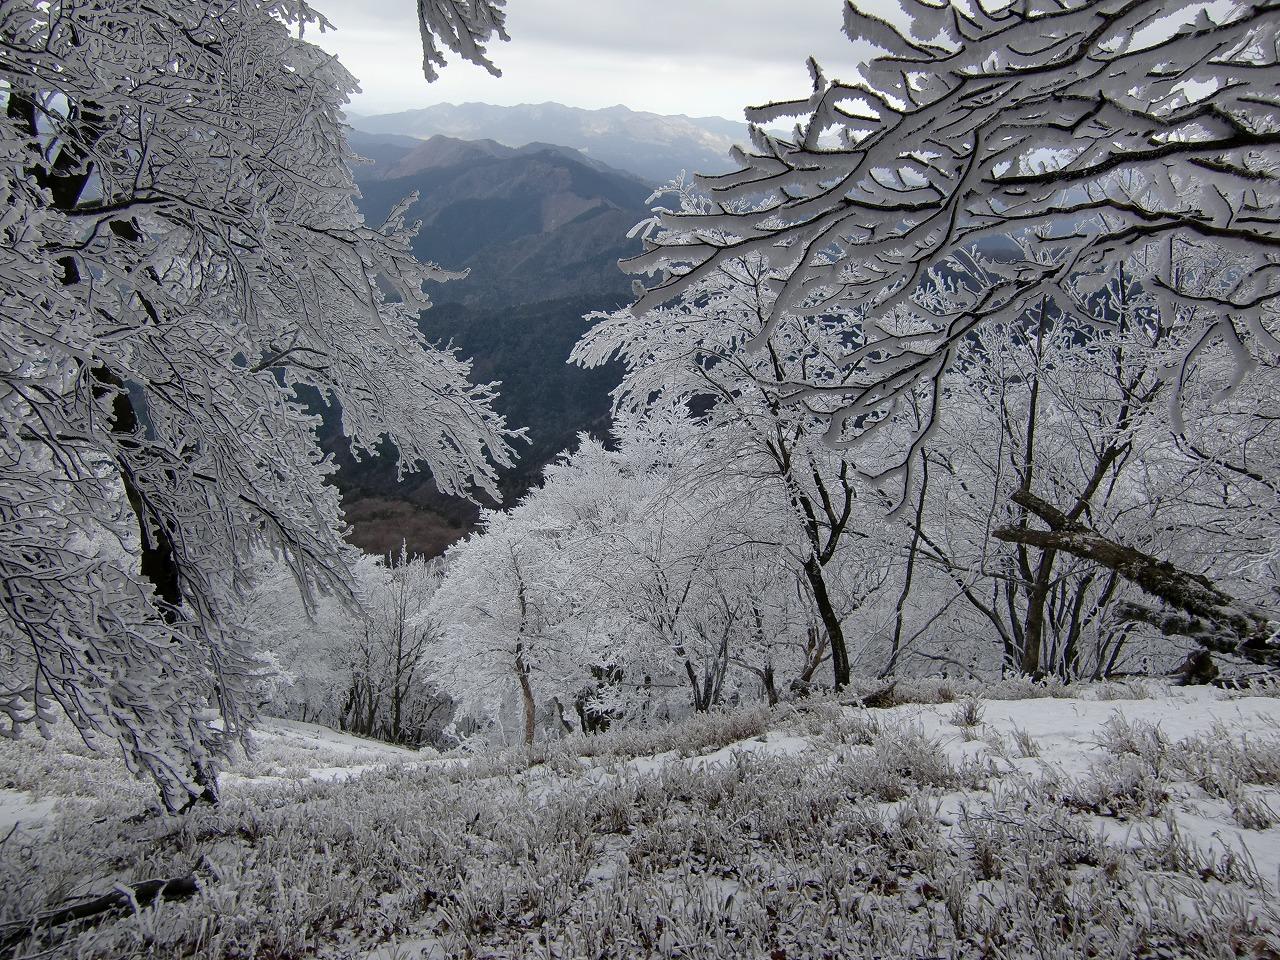 CIMG0282 snowy scene